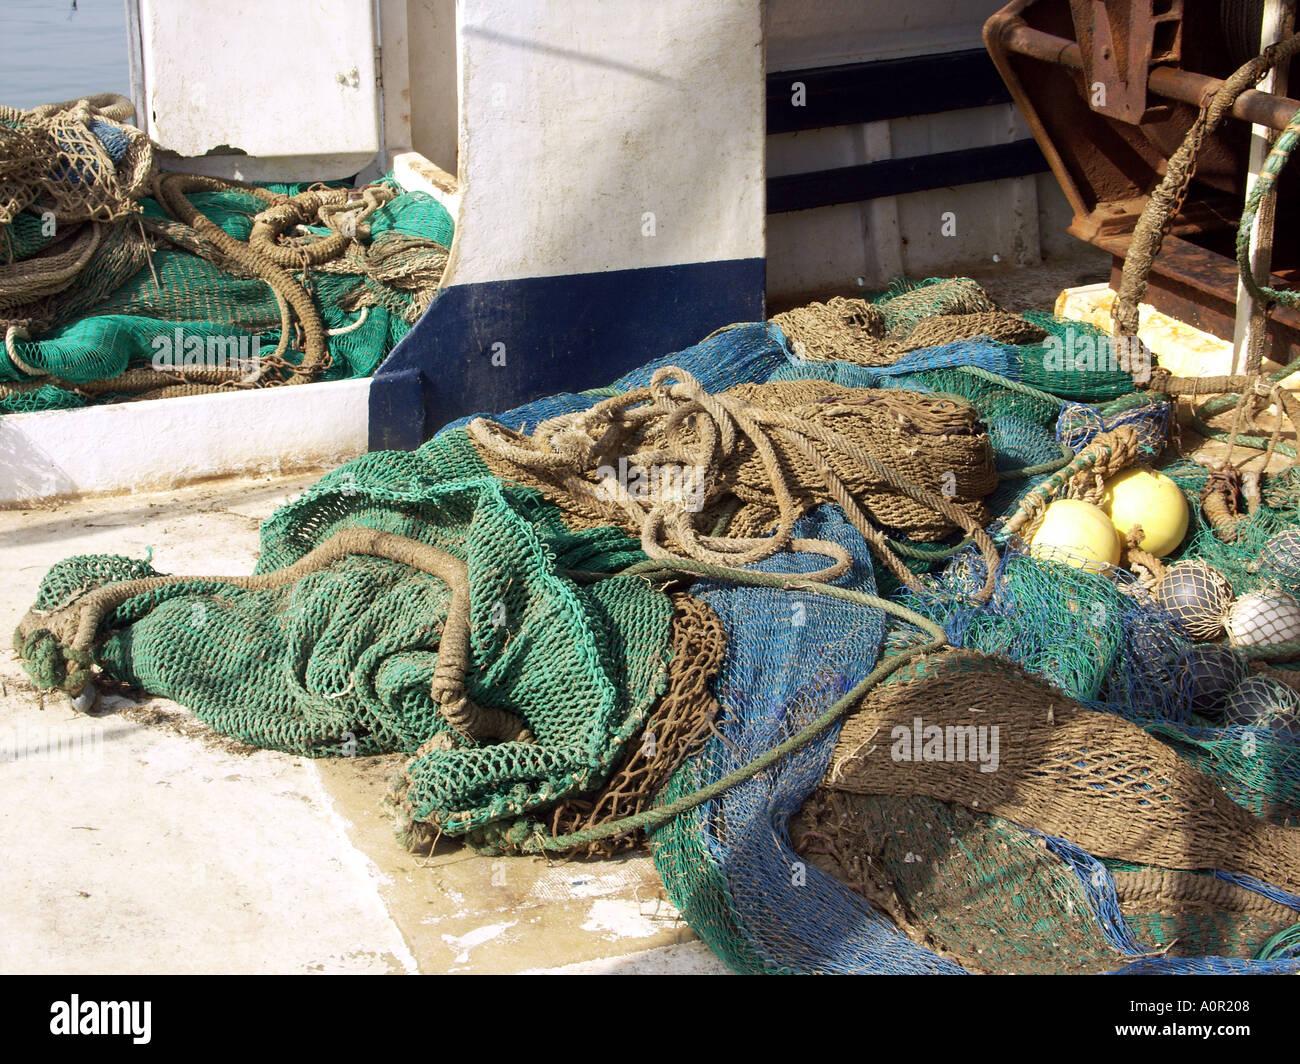 Fishing Nets and Tackle, Puerto Deportivo de Fuengirola, Fuengirola Port, Costa del Sol, Andalucia, Spain - Stock Image